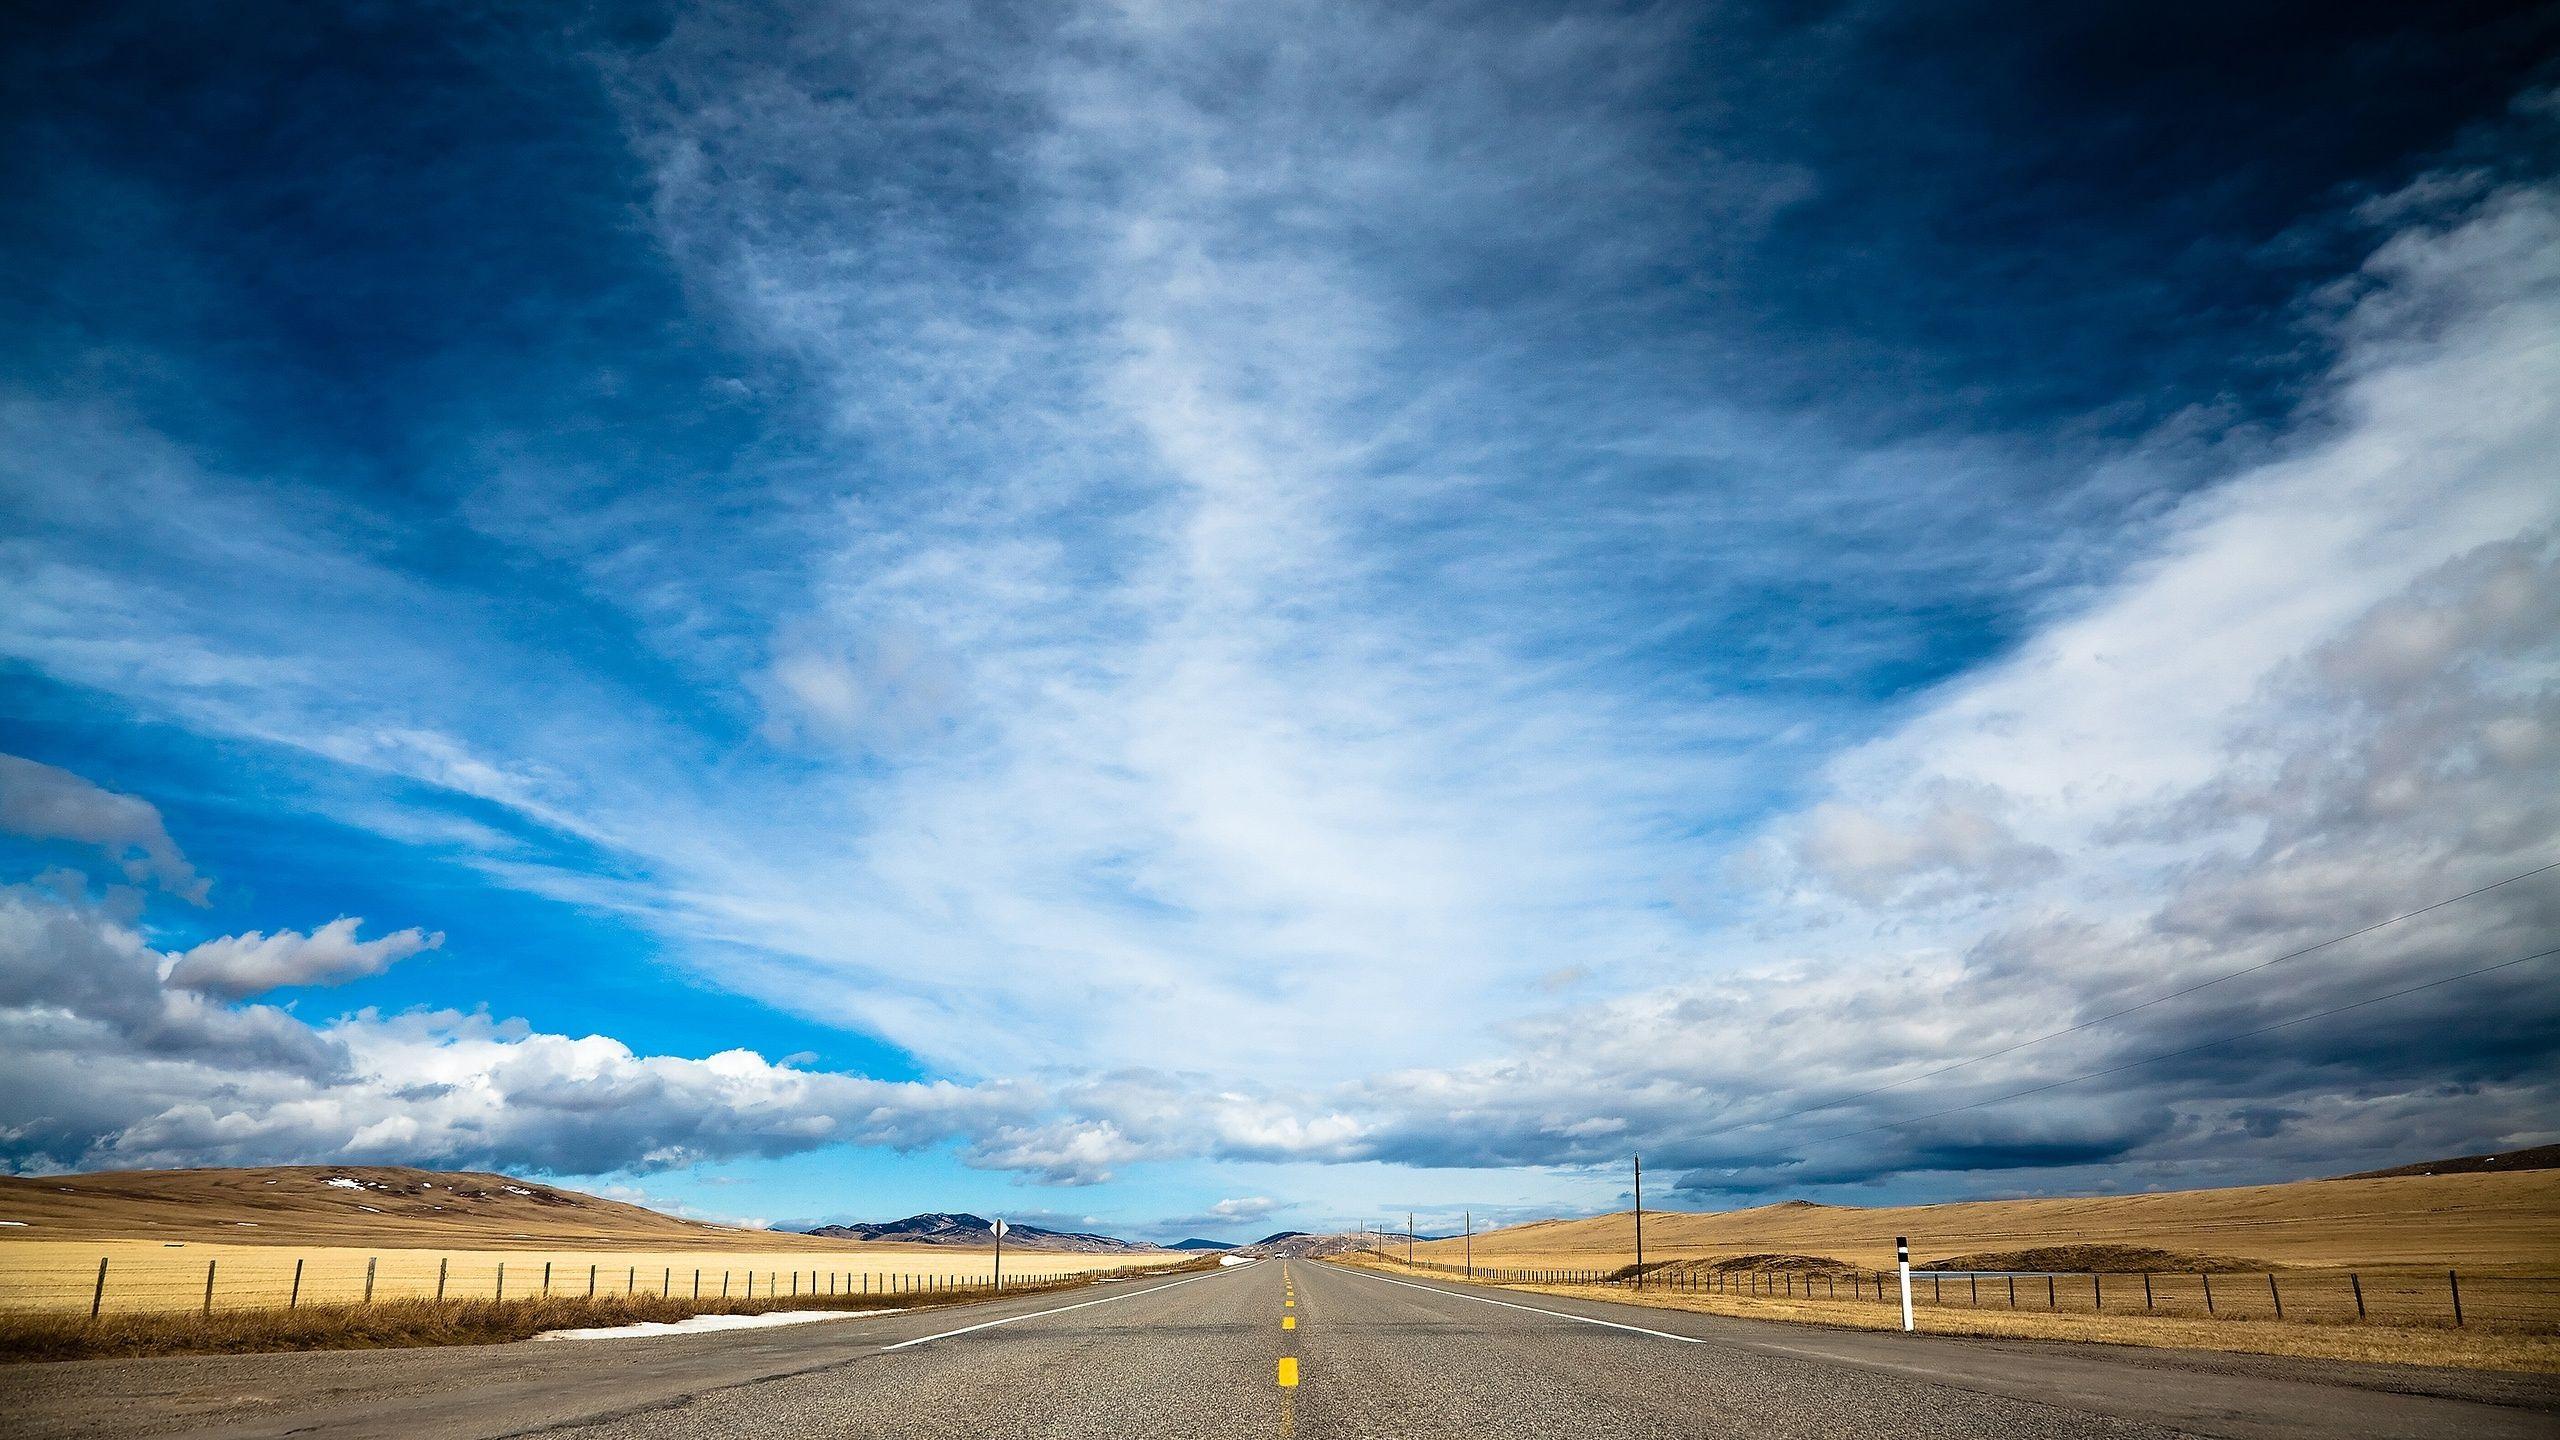 Wallpaper road 4k HD wallpaper clouds day sky dream Nature 127 2560x1440